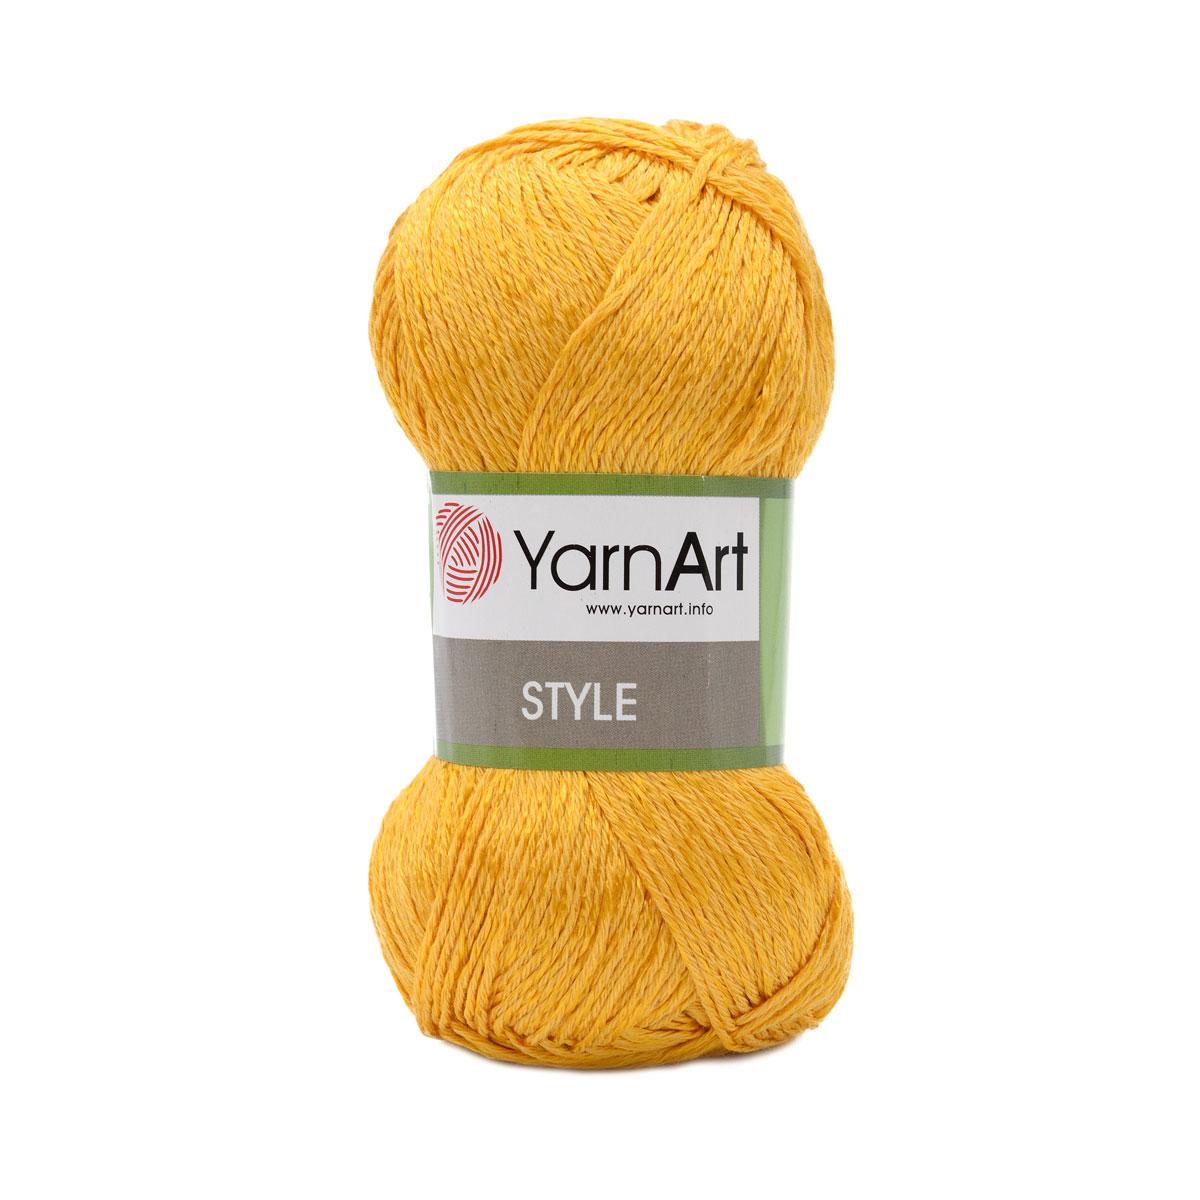 Пряжа YarnArt 'Style' 50гр 185м (67% хлопок, 33% вискоза)